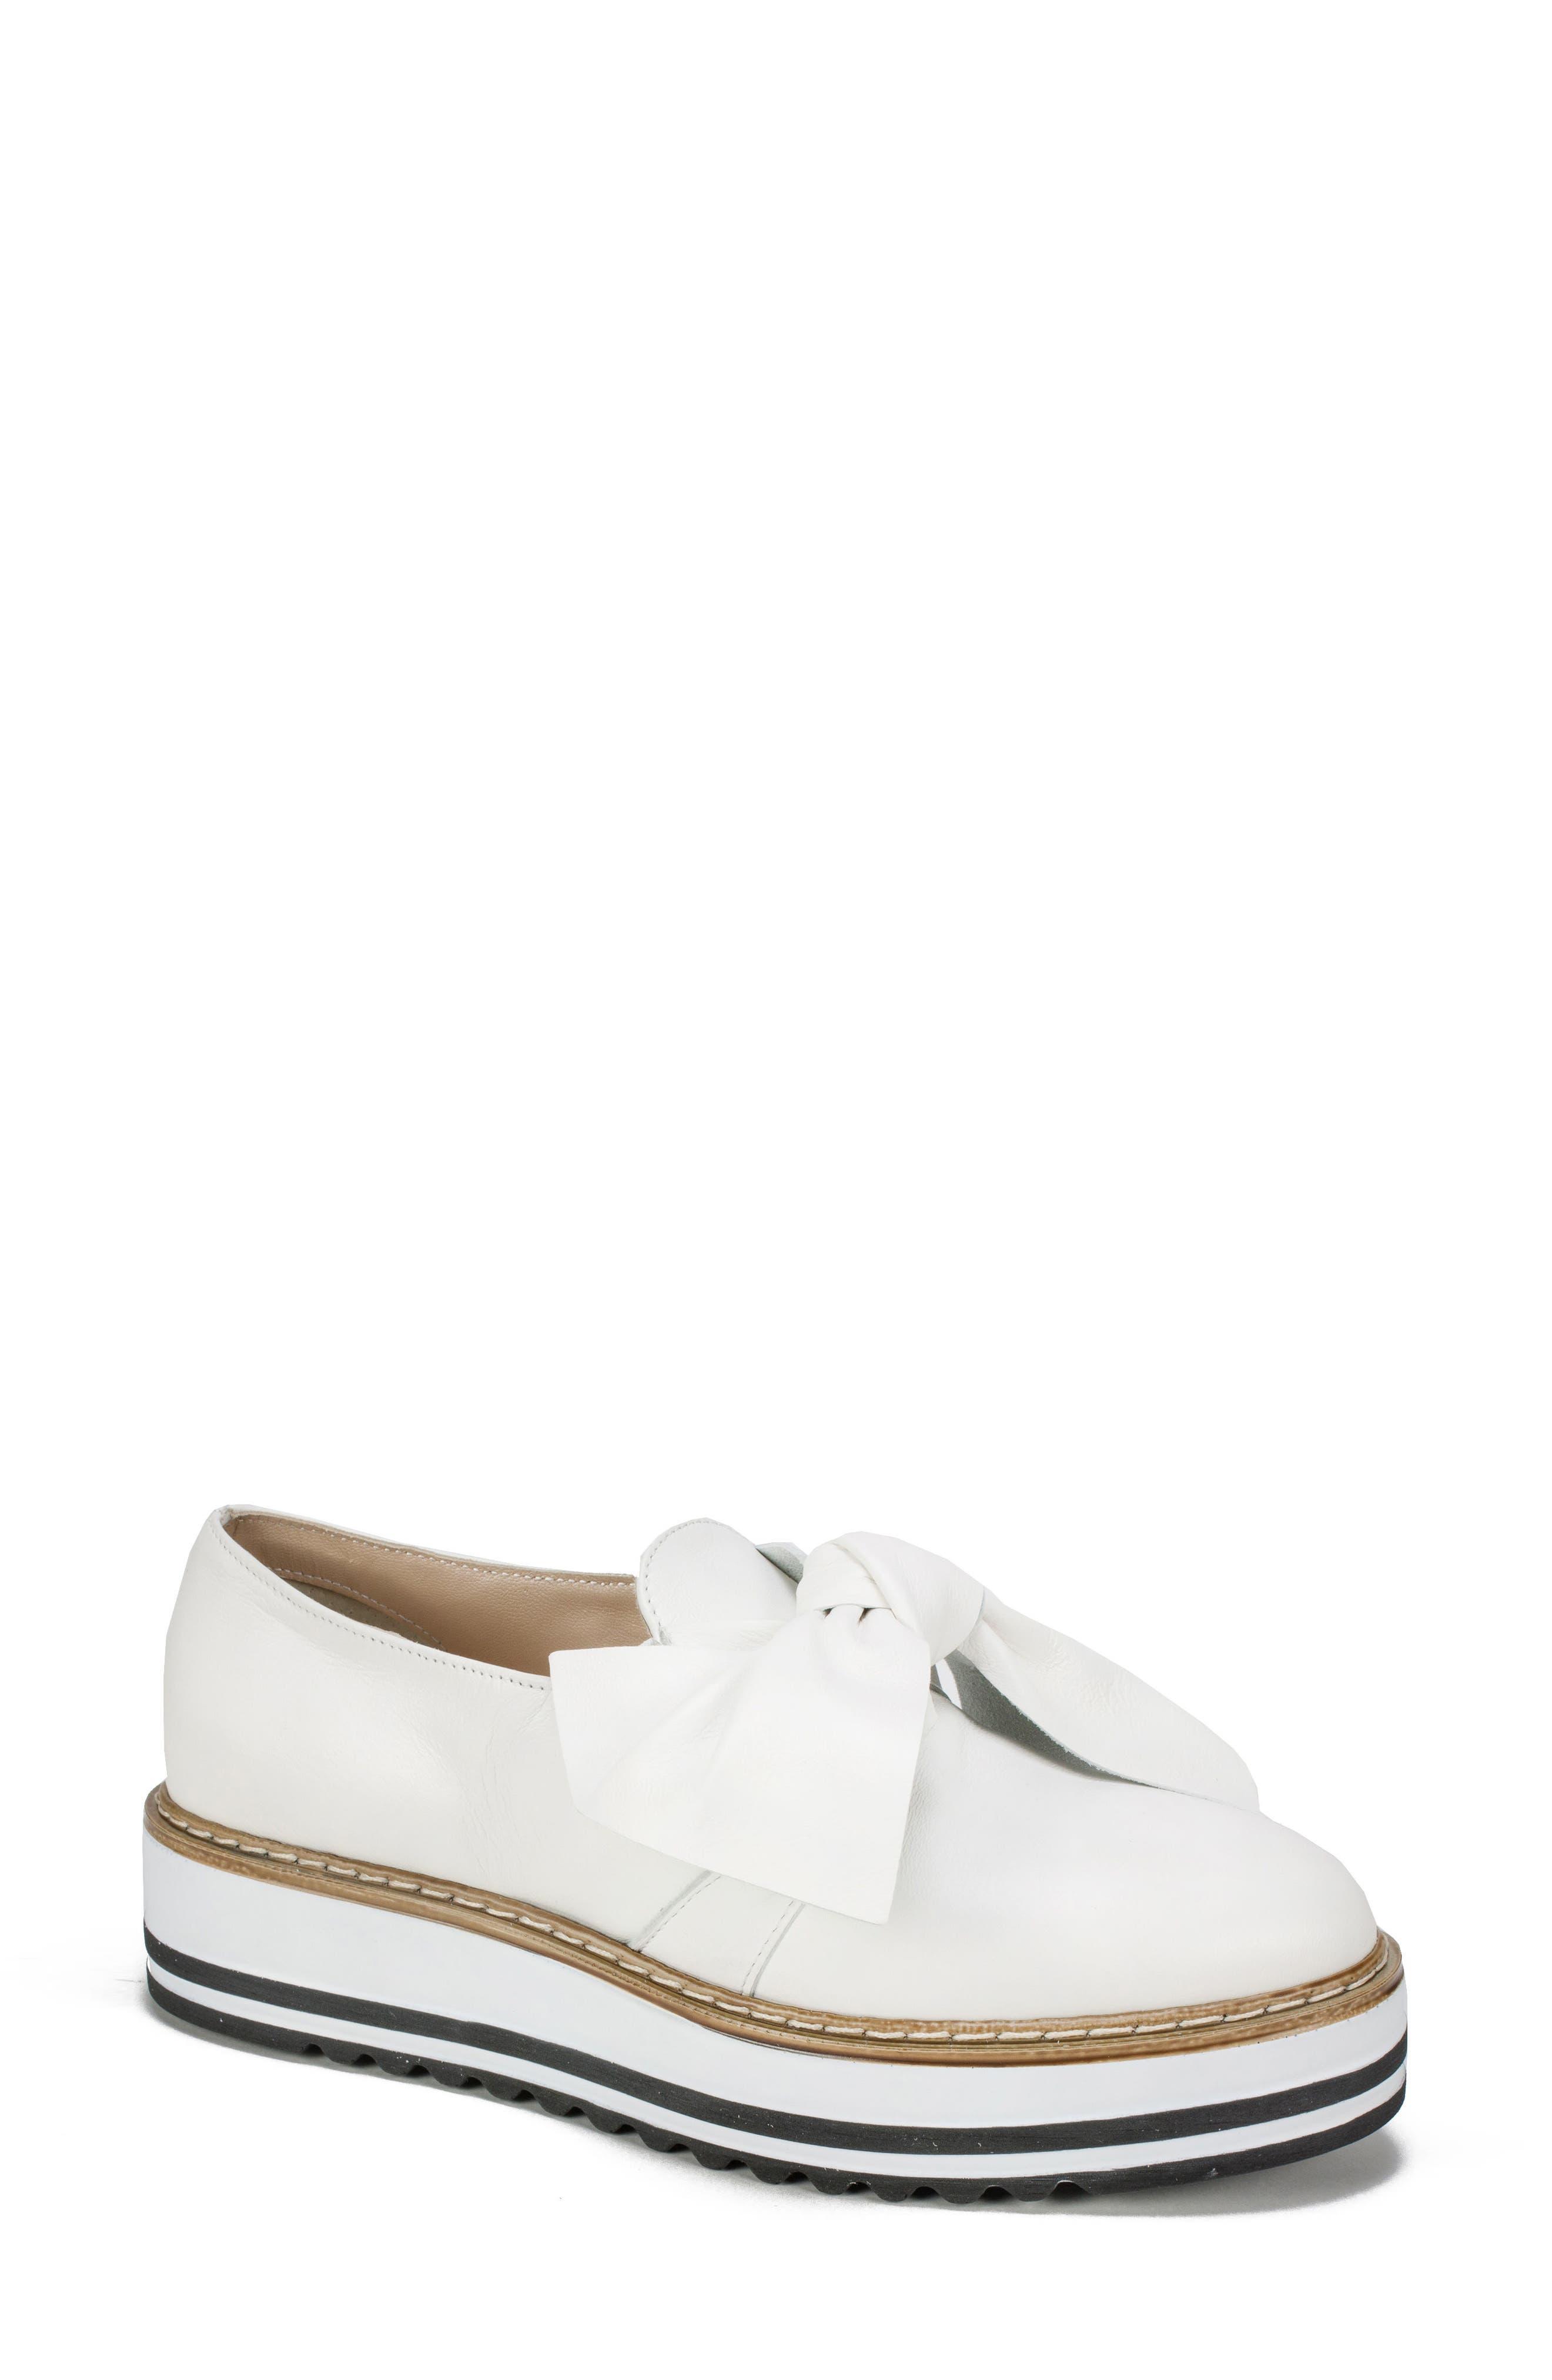 Bella Platform Loafer,                             Main thumbnail 1, color,                             WHITE LEATHER